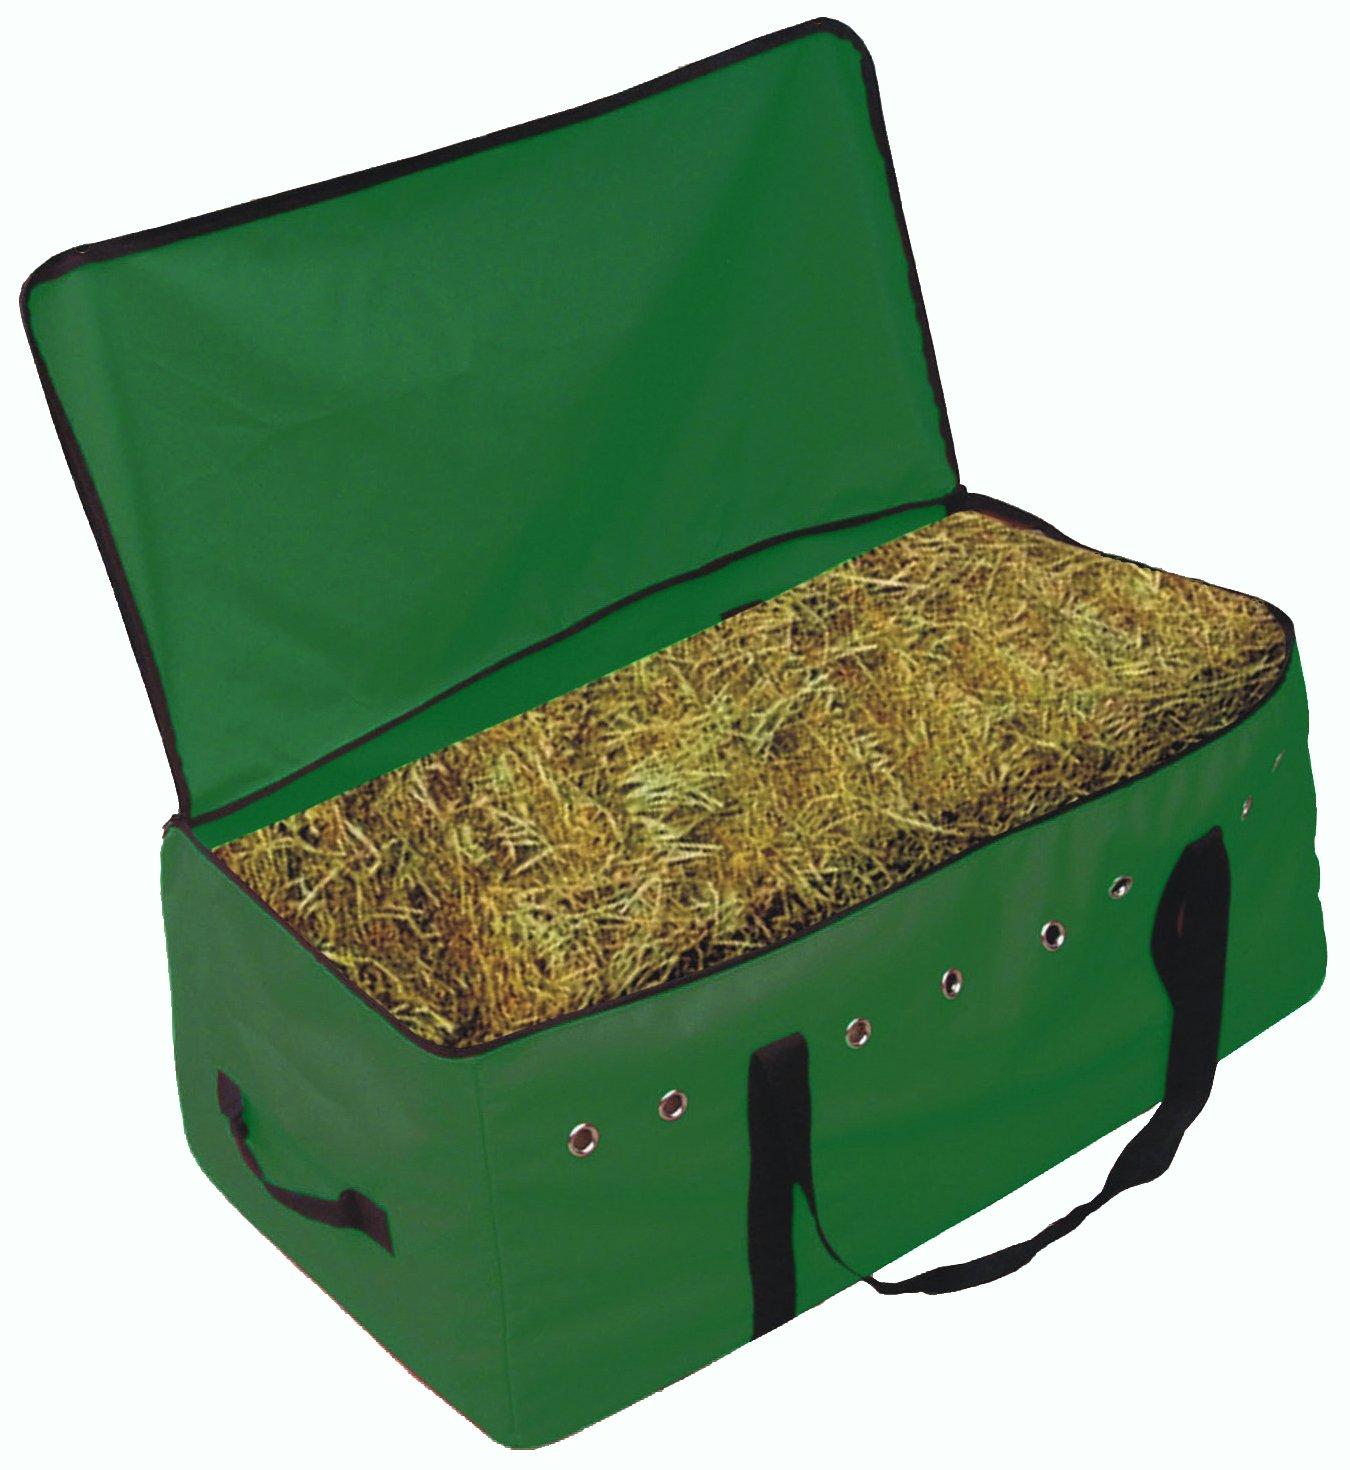 Royal Hamilton HBB-HG Hay Bale Bag, Assorted Colors